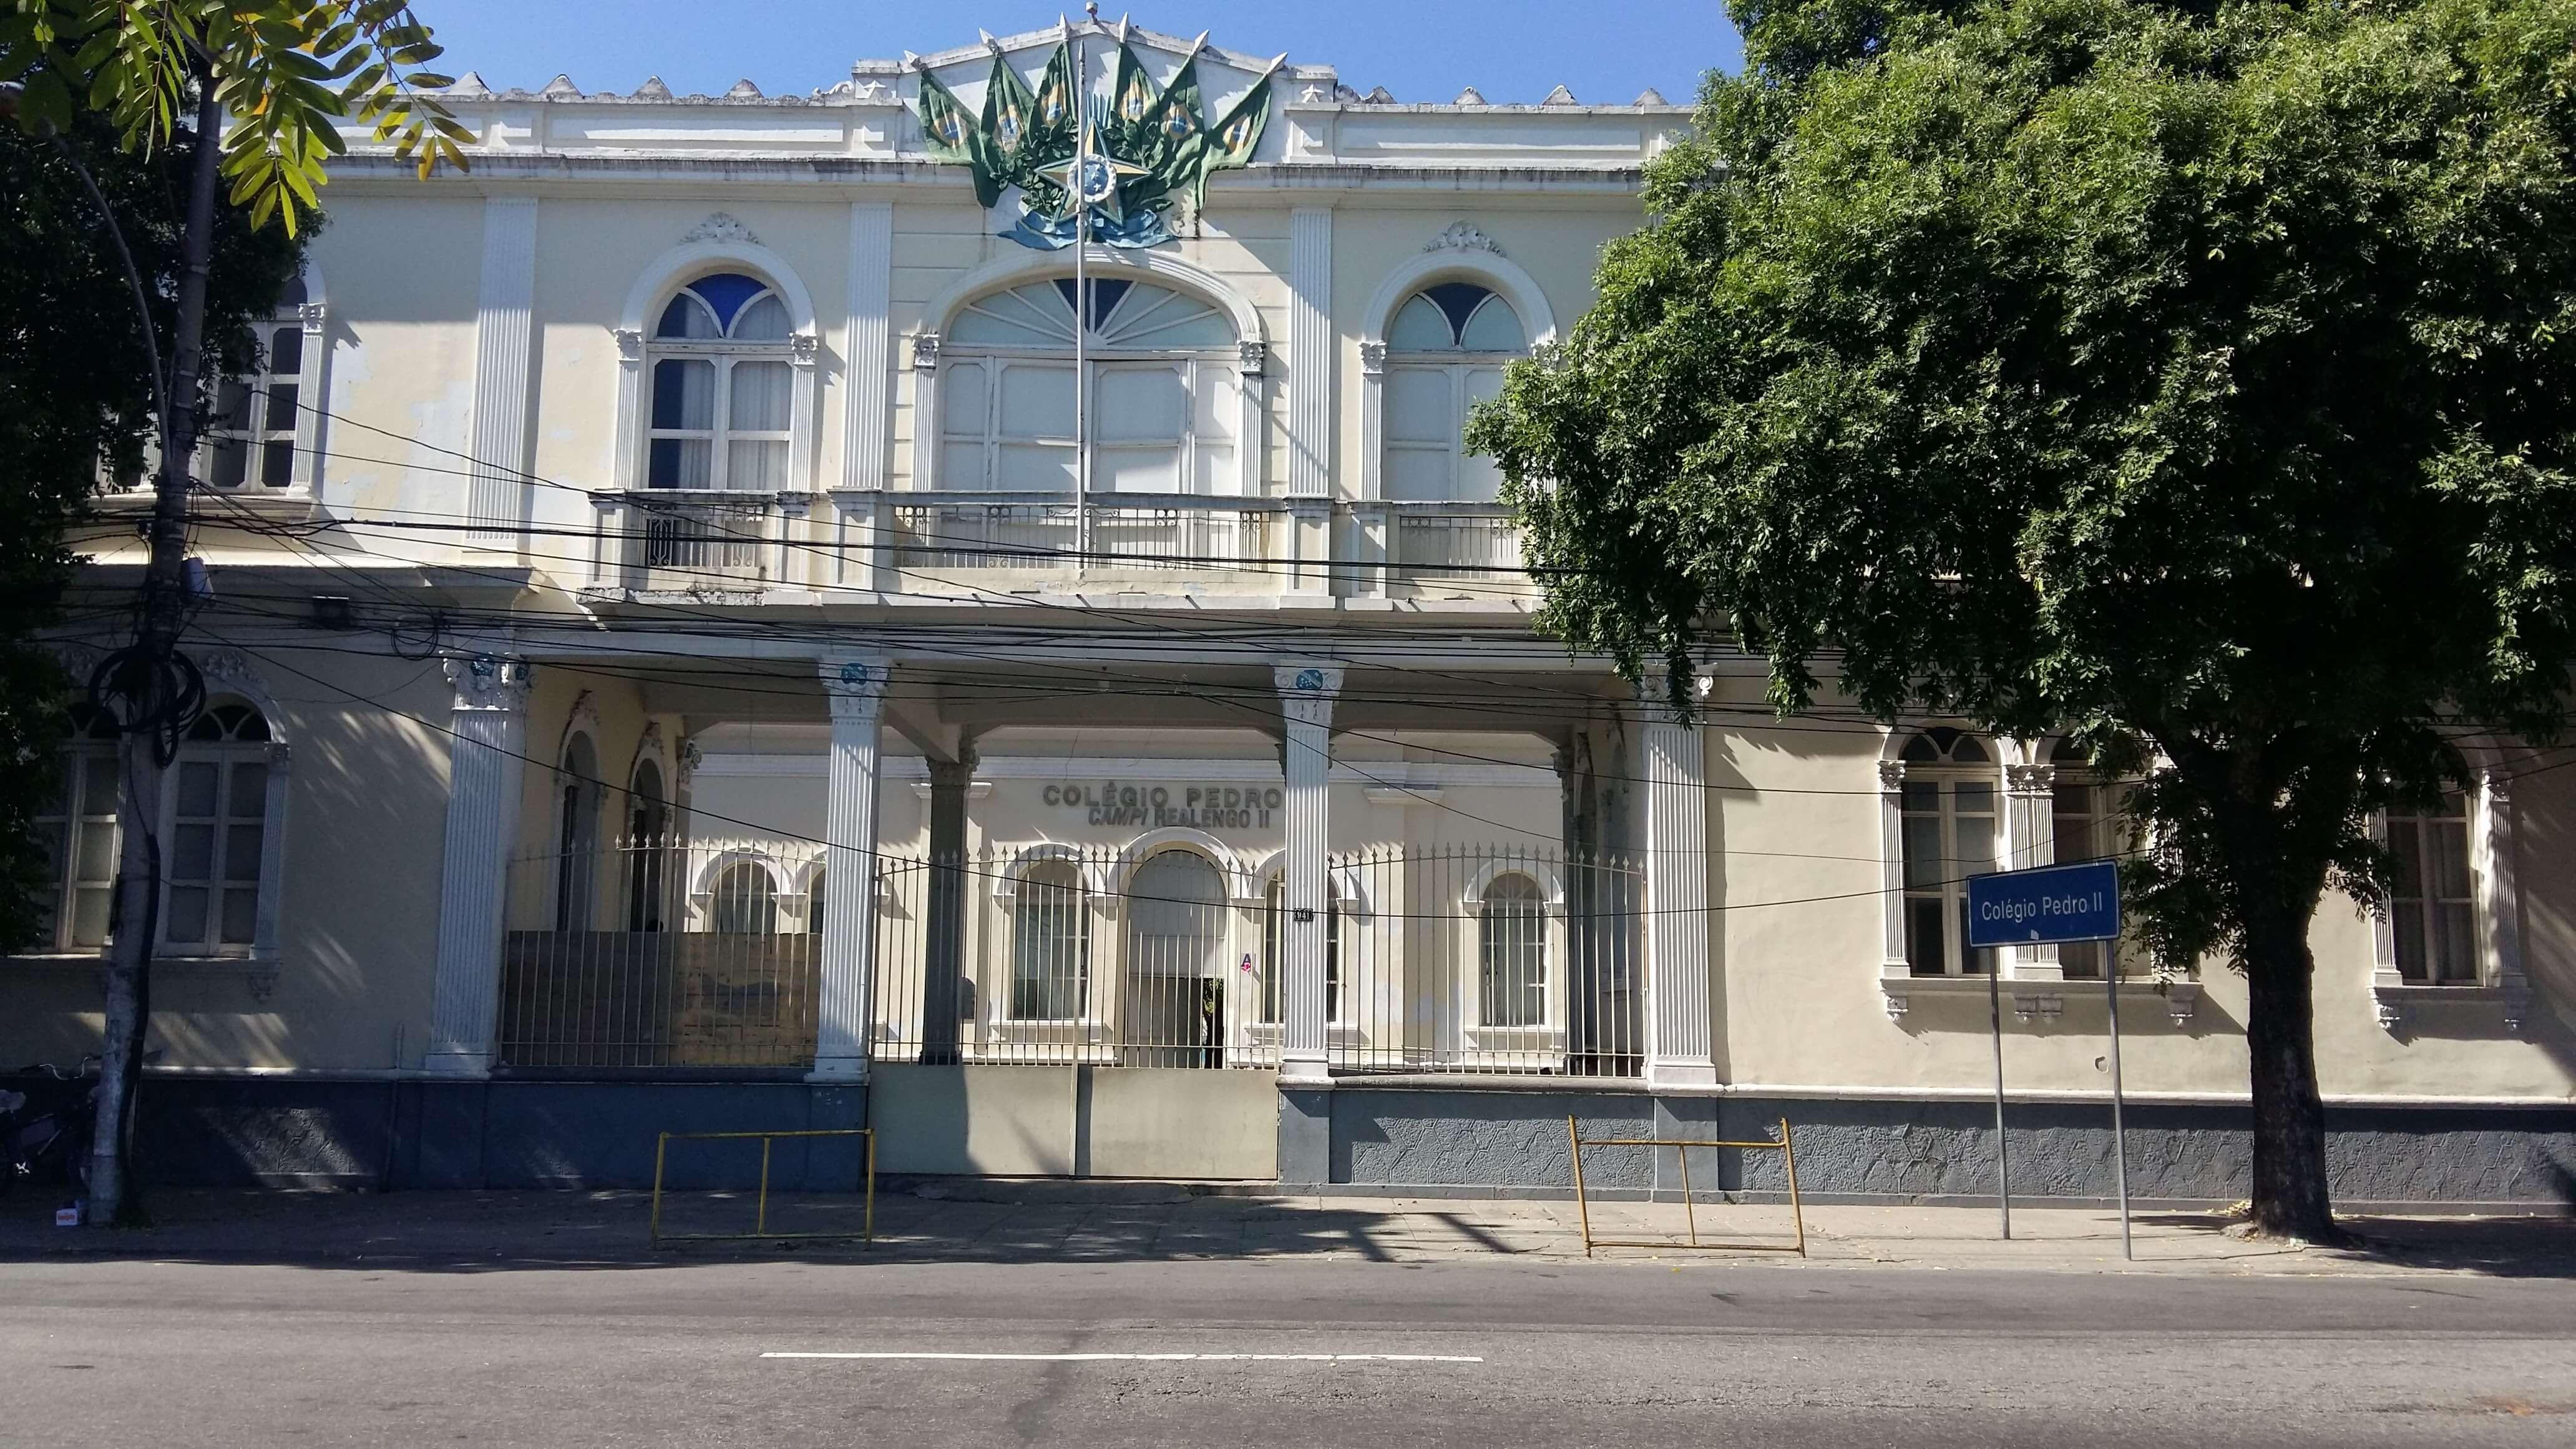 Colegio Pedro II realiza novo concurso (Foto: Divulgacao/Pedro II)